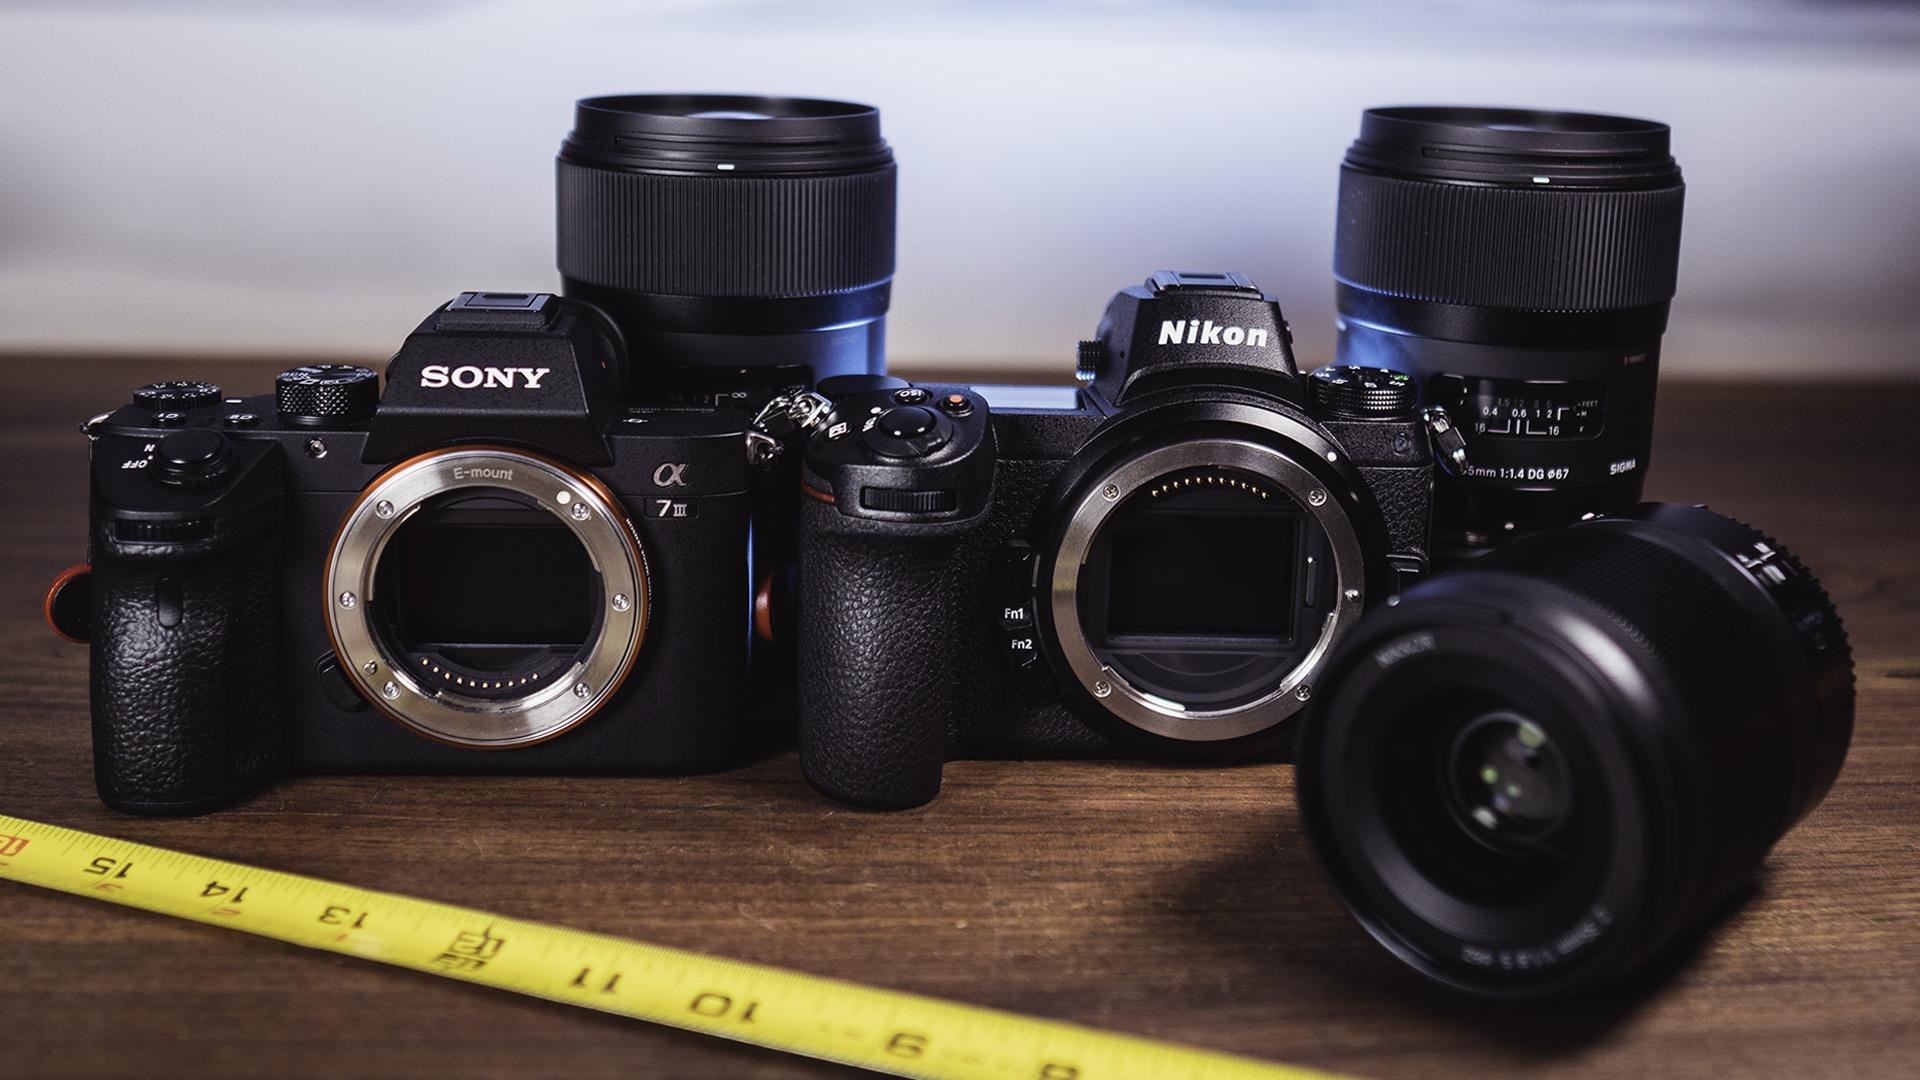 Sony a7 III vs Nikon Z6 + Sigma Art 35mm FTZ vs Nikon 35mm f